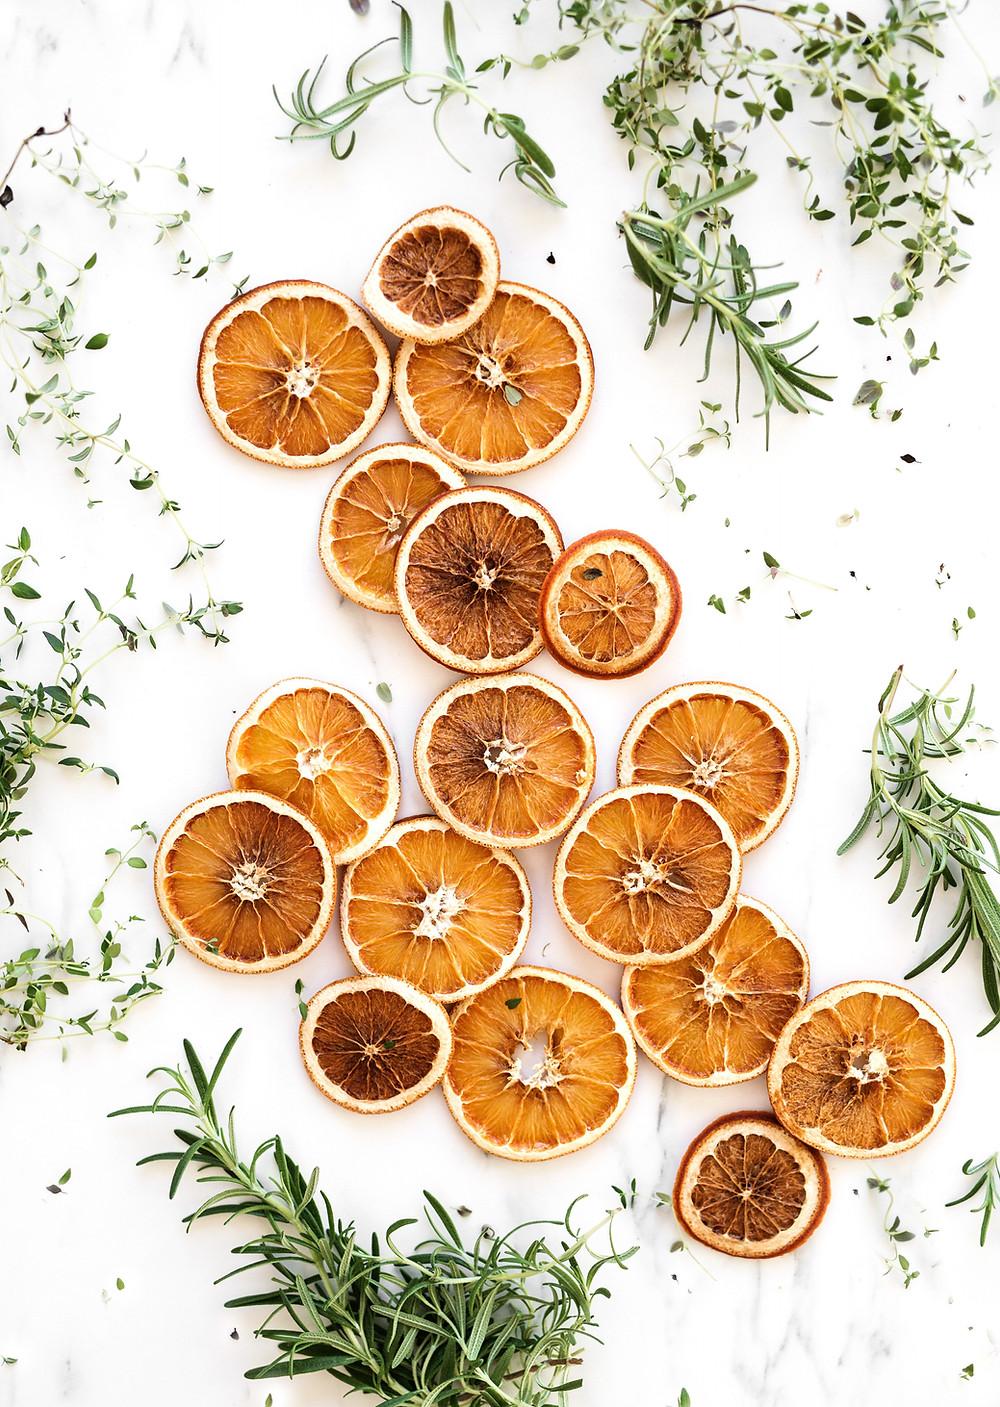 Orangen - Vitamin C - Erkältung